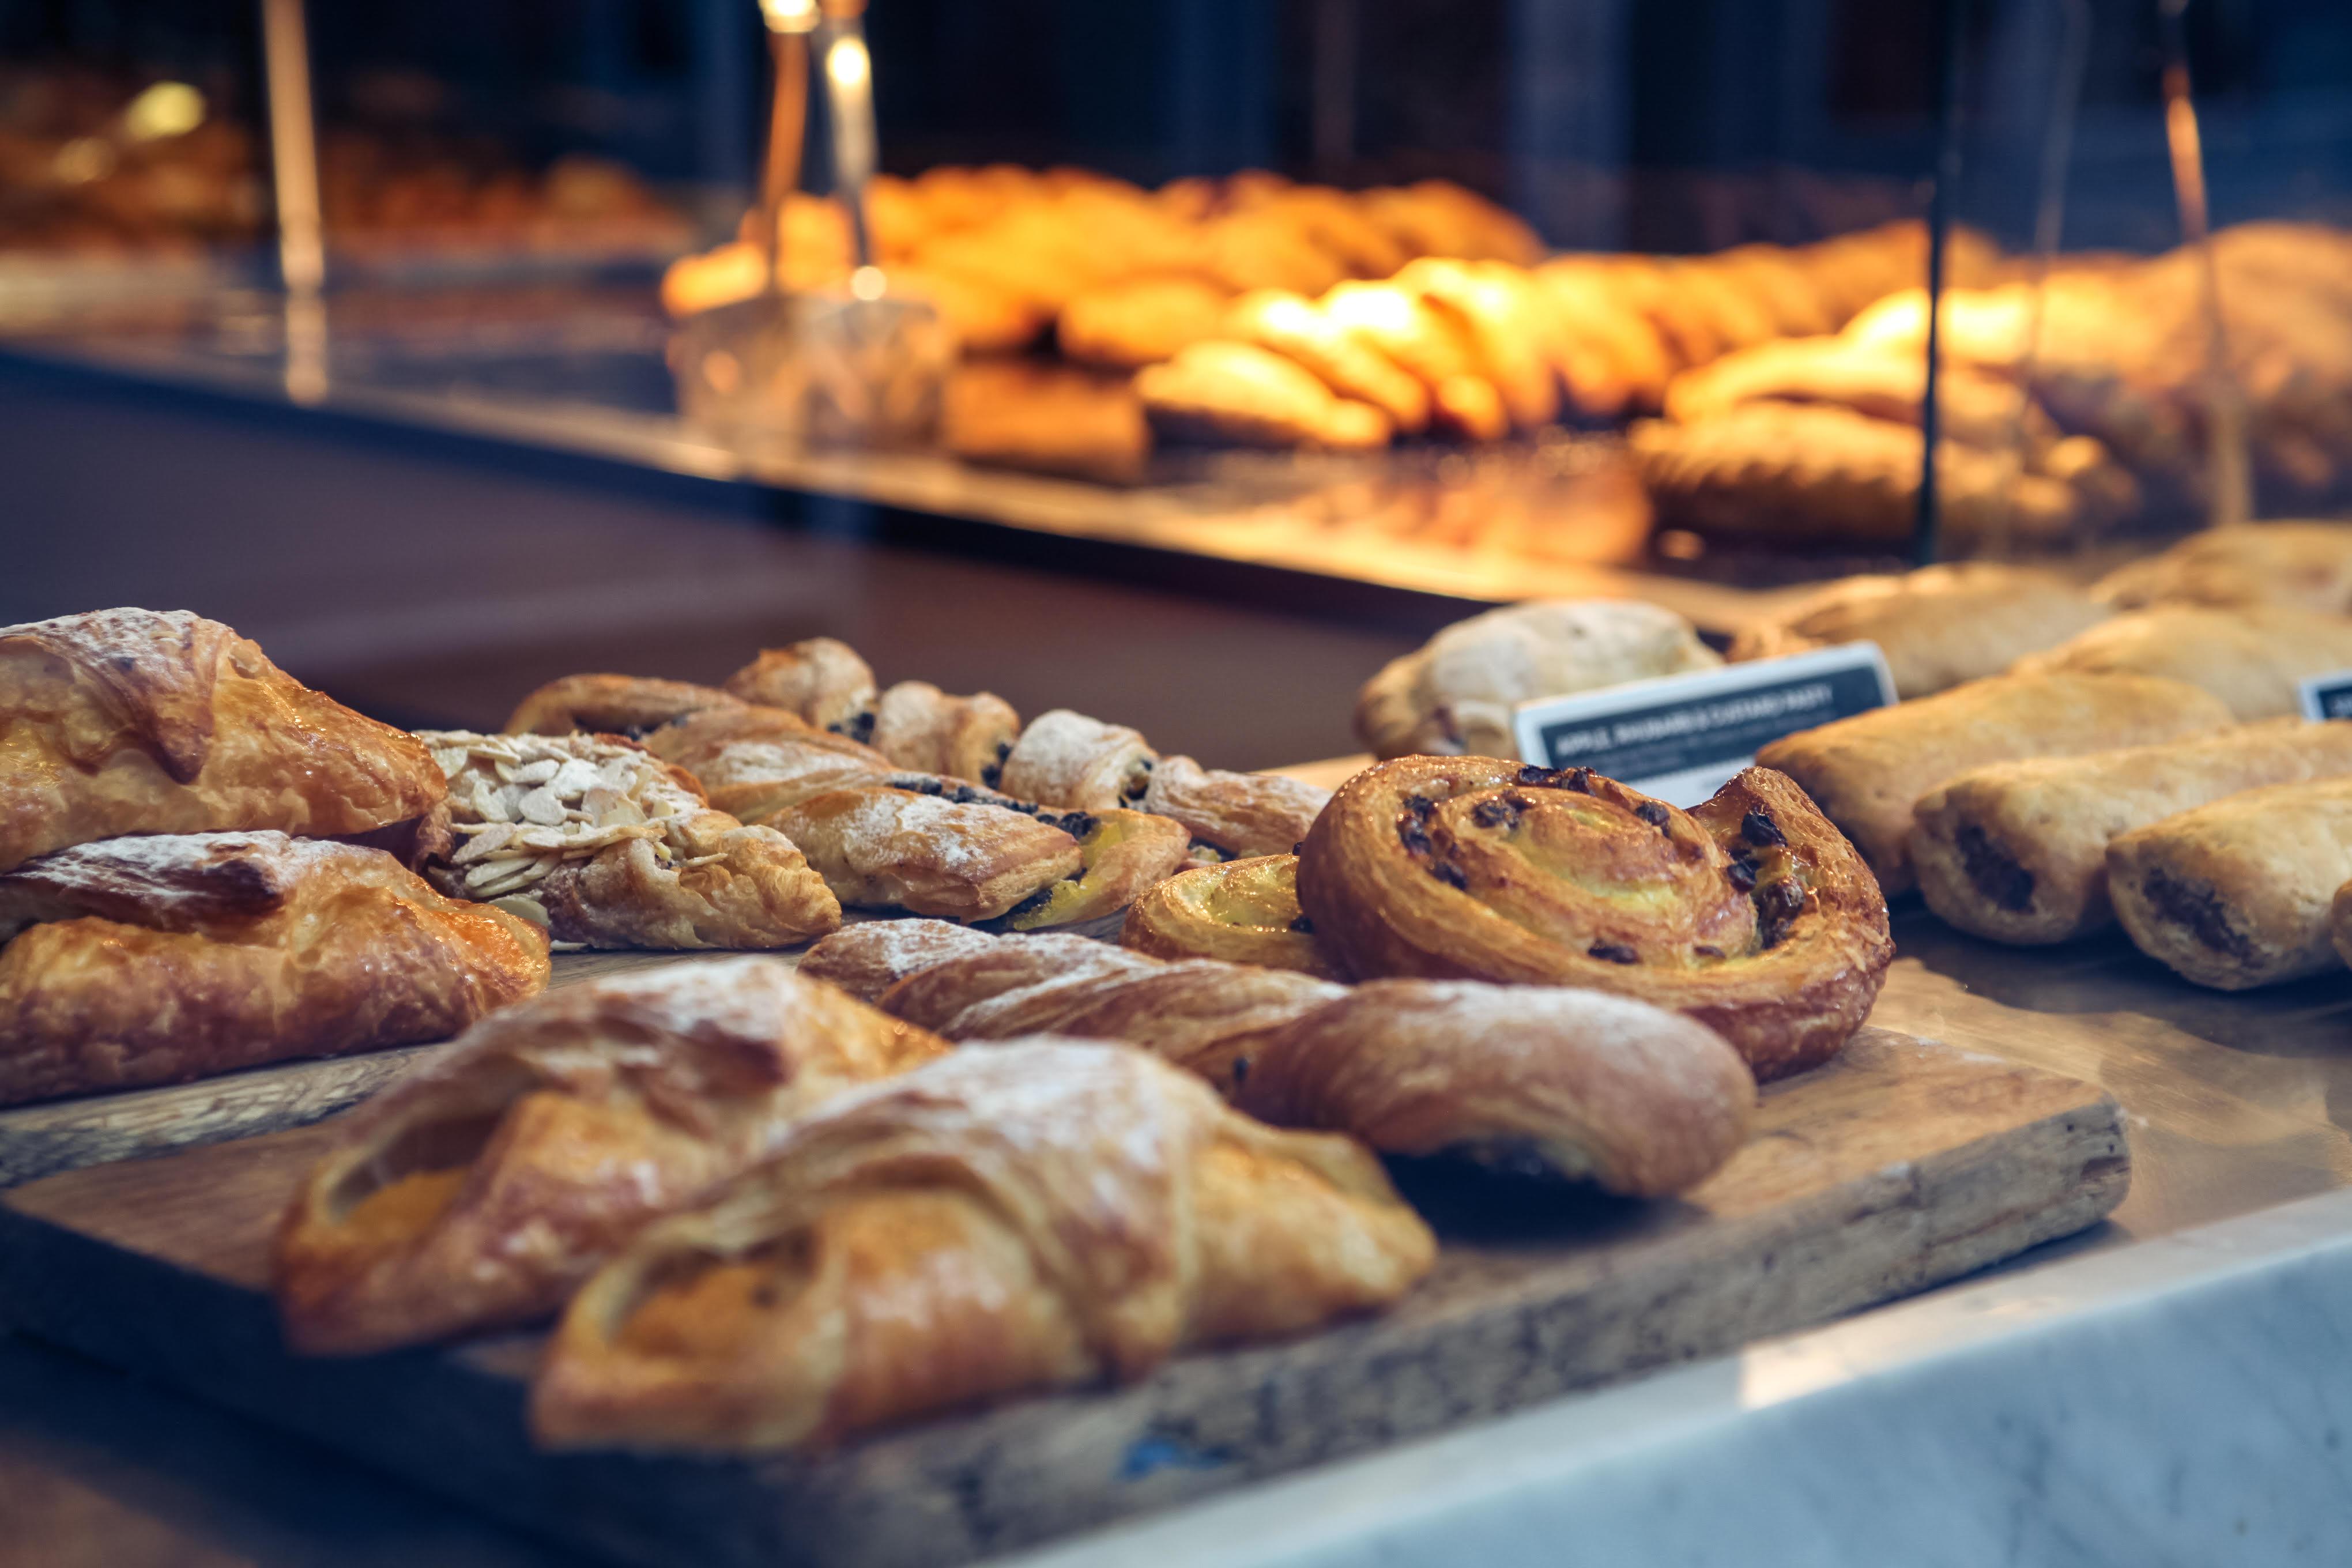 Saudi International Bakery and Pastry Expo (SIBP)